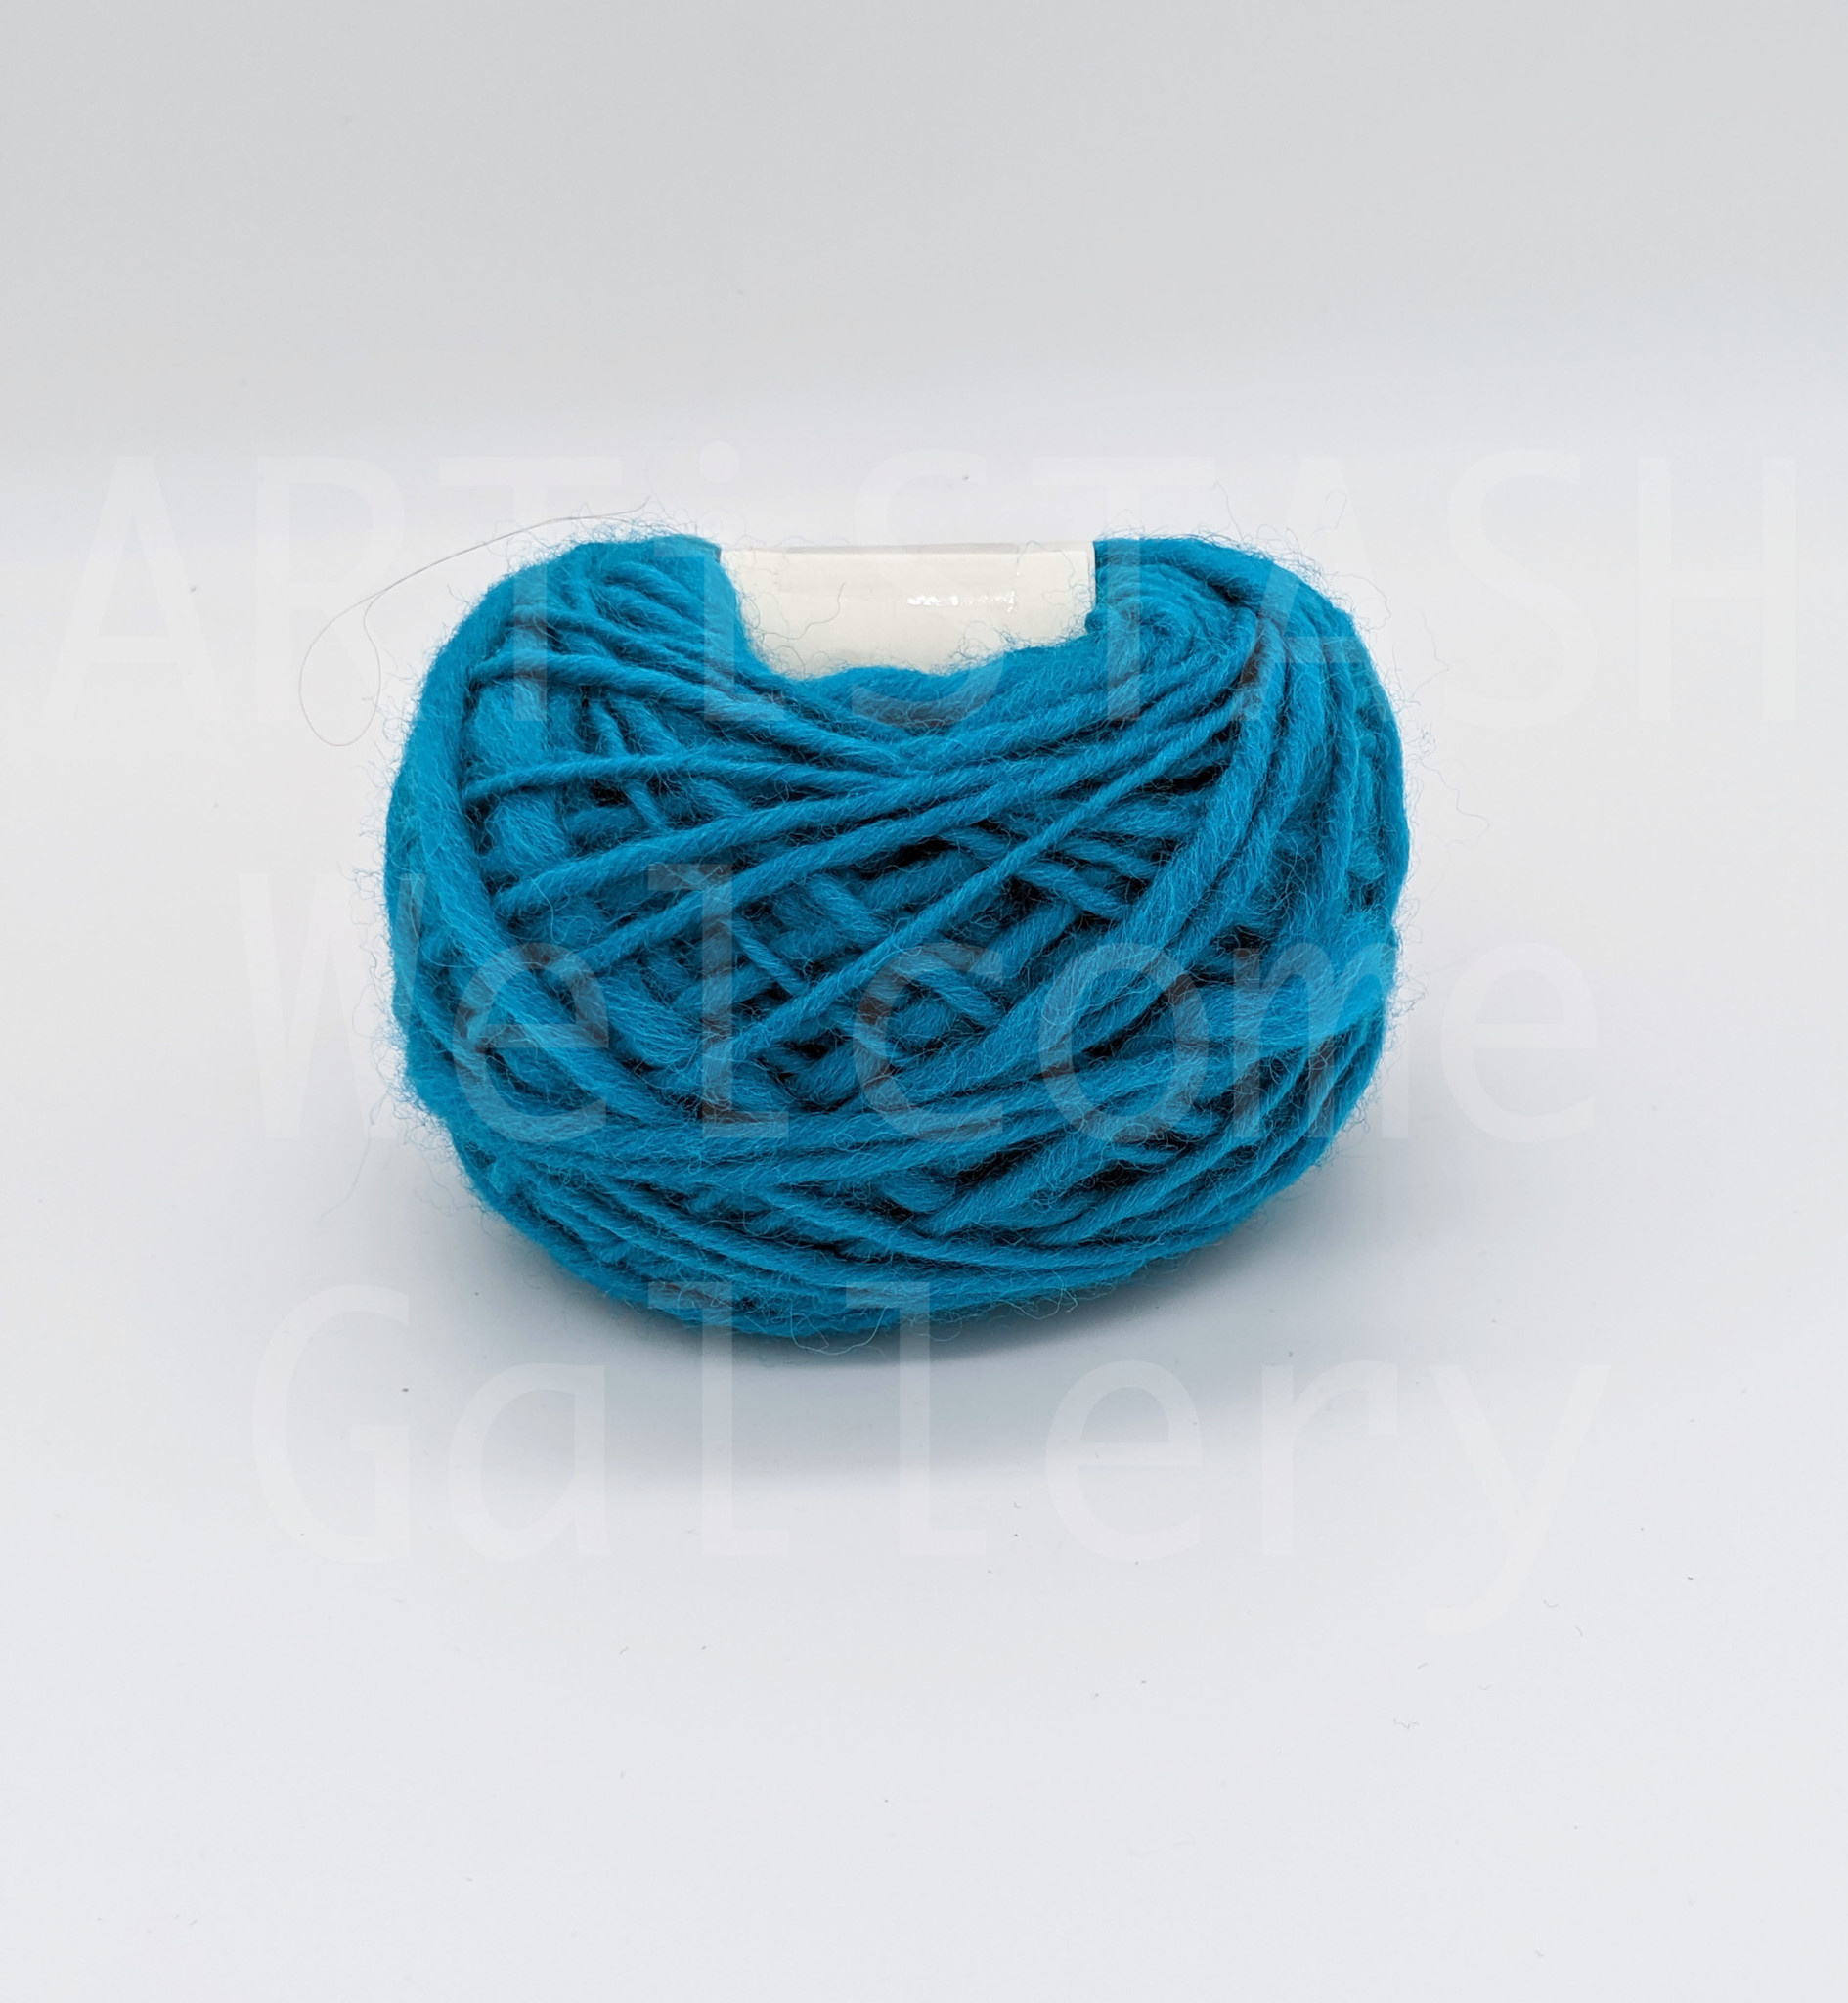 Just Sabine Hand Spun Yarn, Desert Turquoise, 56 Yards